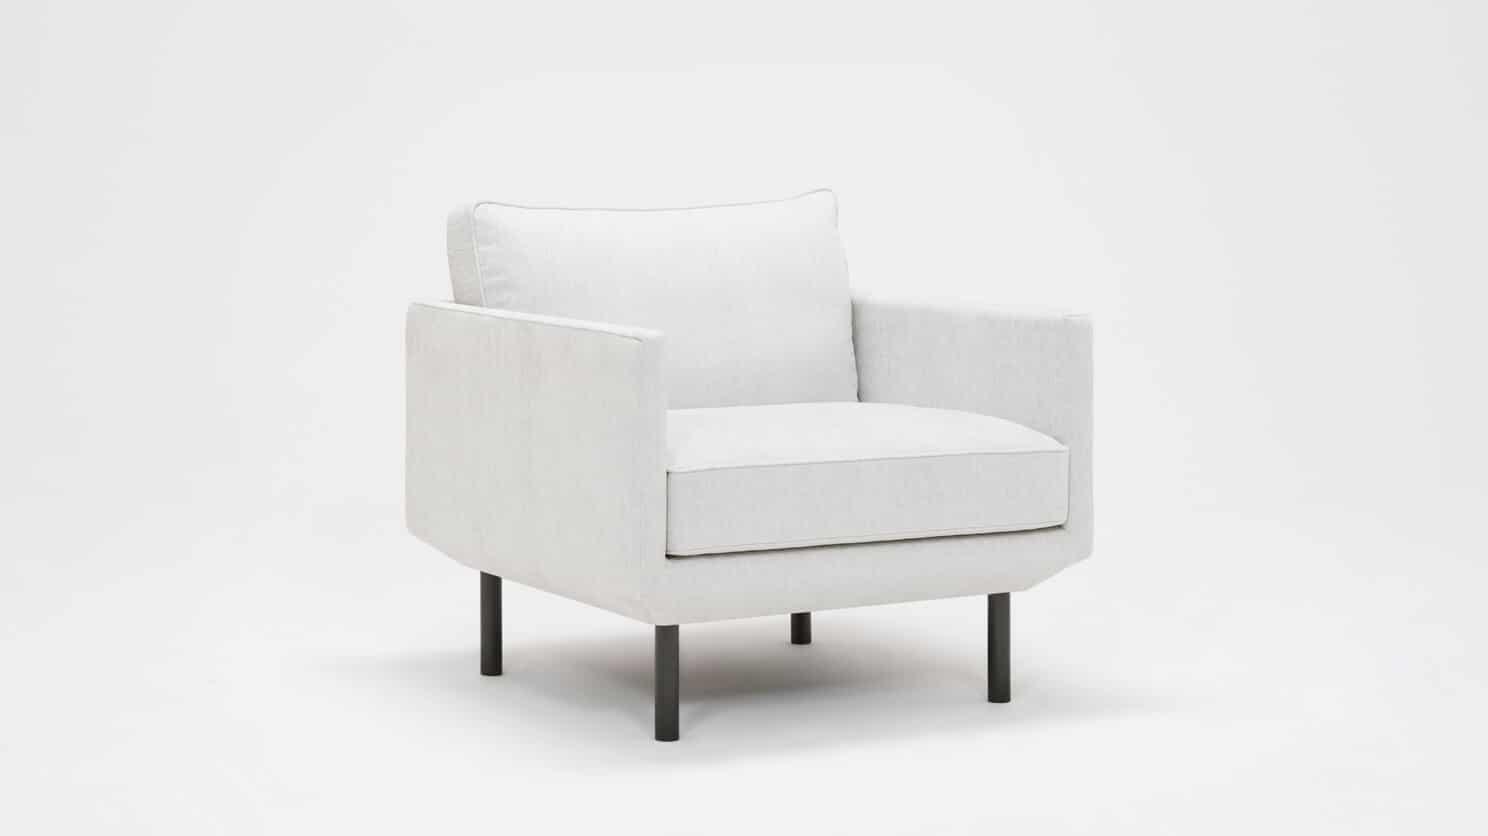 30154 95 2 chairs plateau club chair feather coda marble corner 01